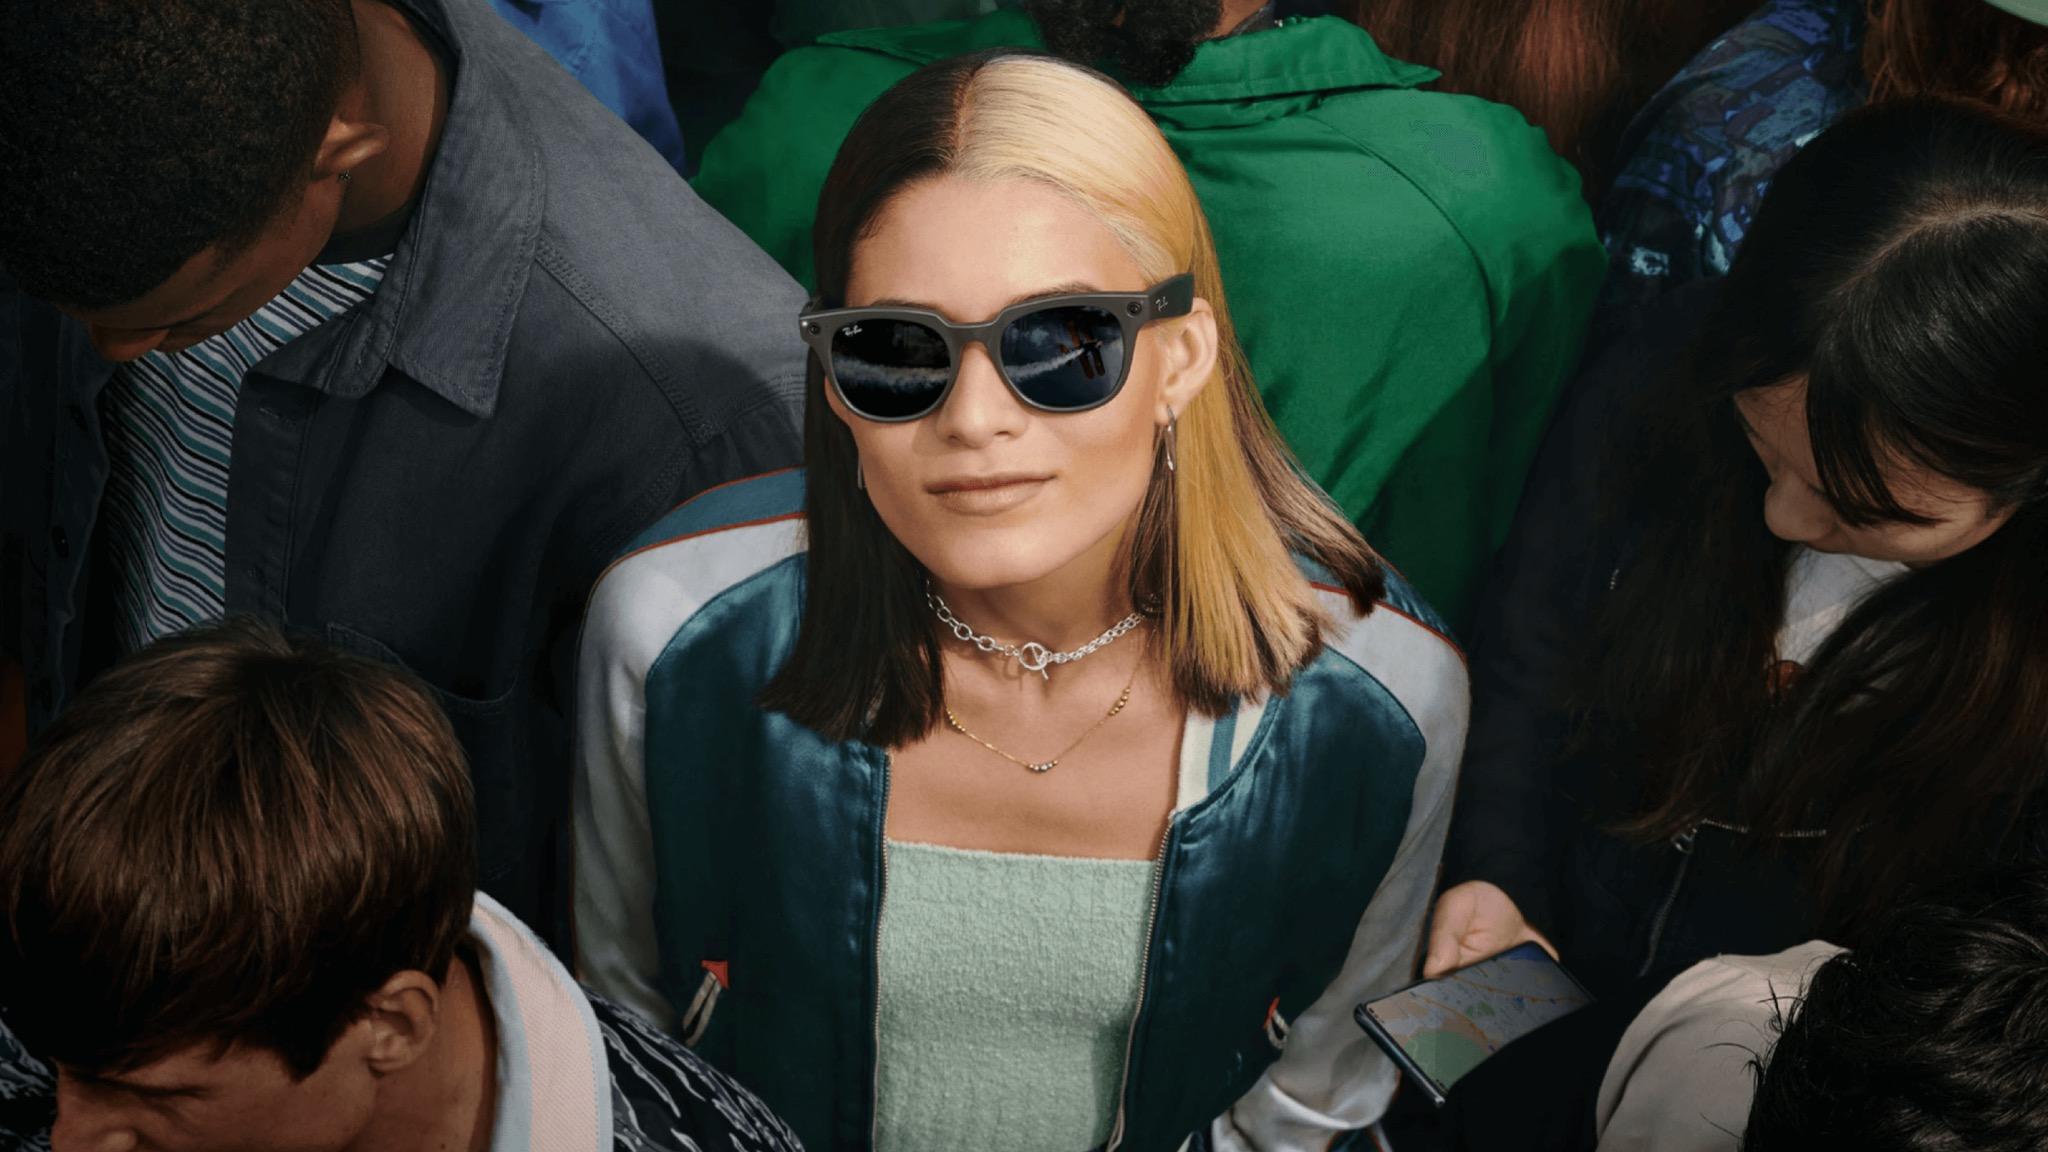 Ray-Ban Stories: Facebook launcht smarte Sonnenbrille